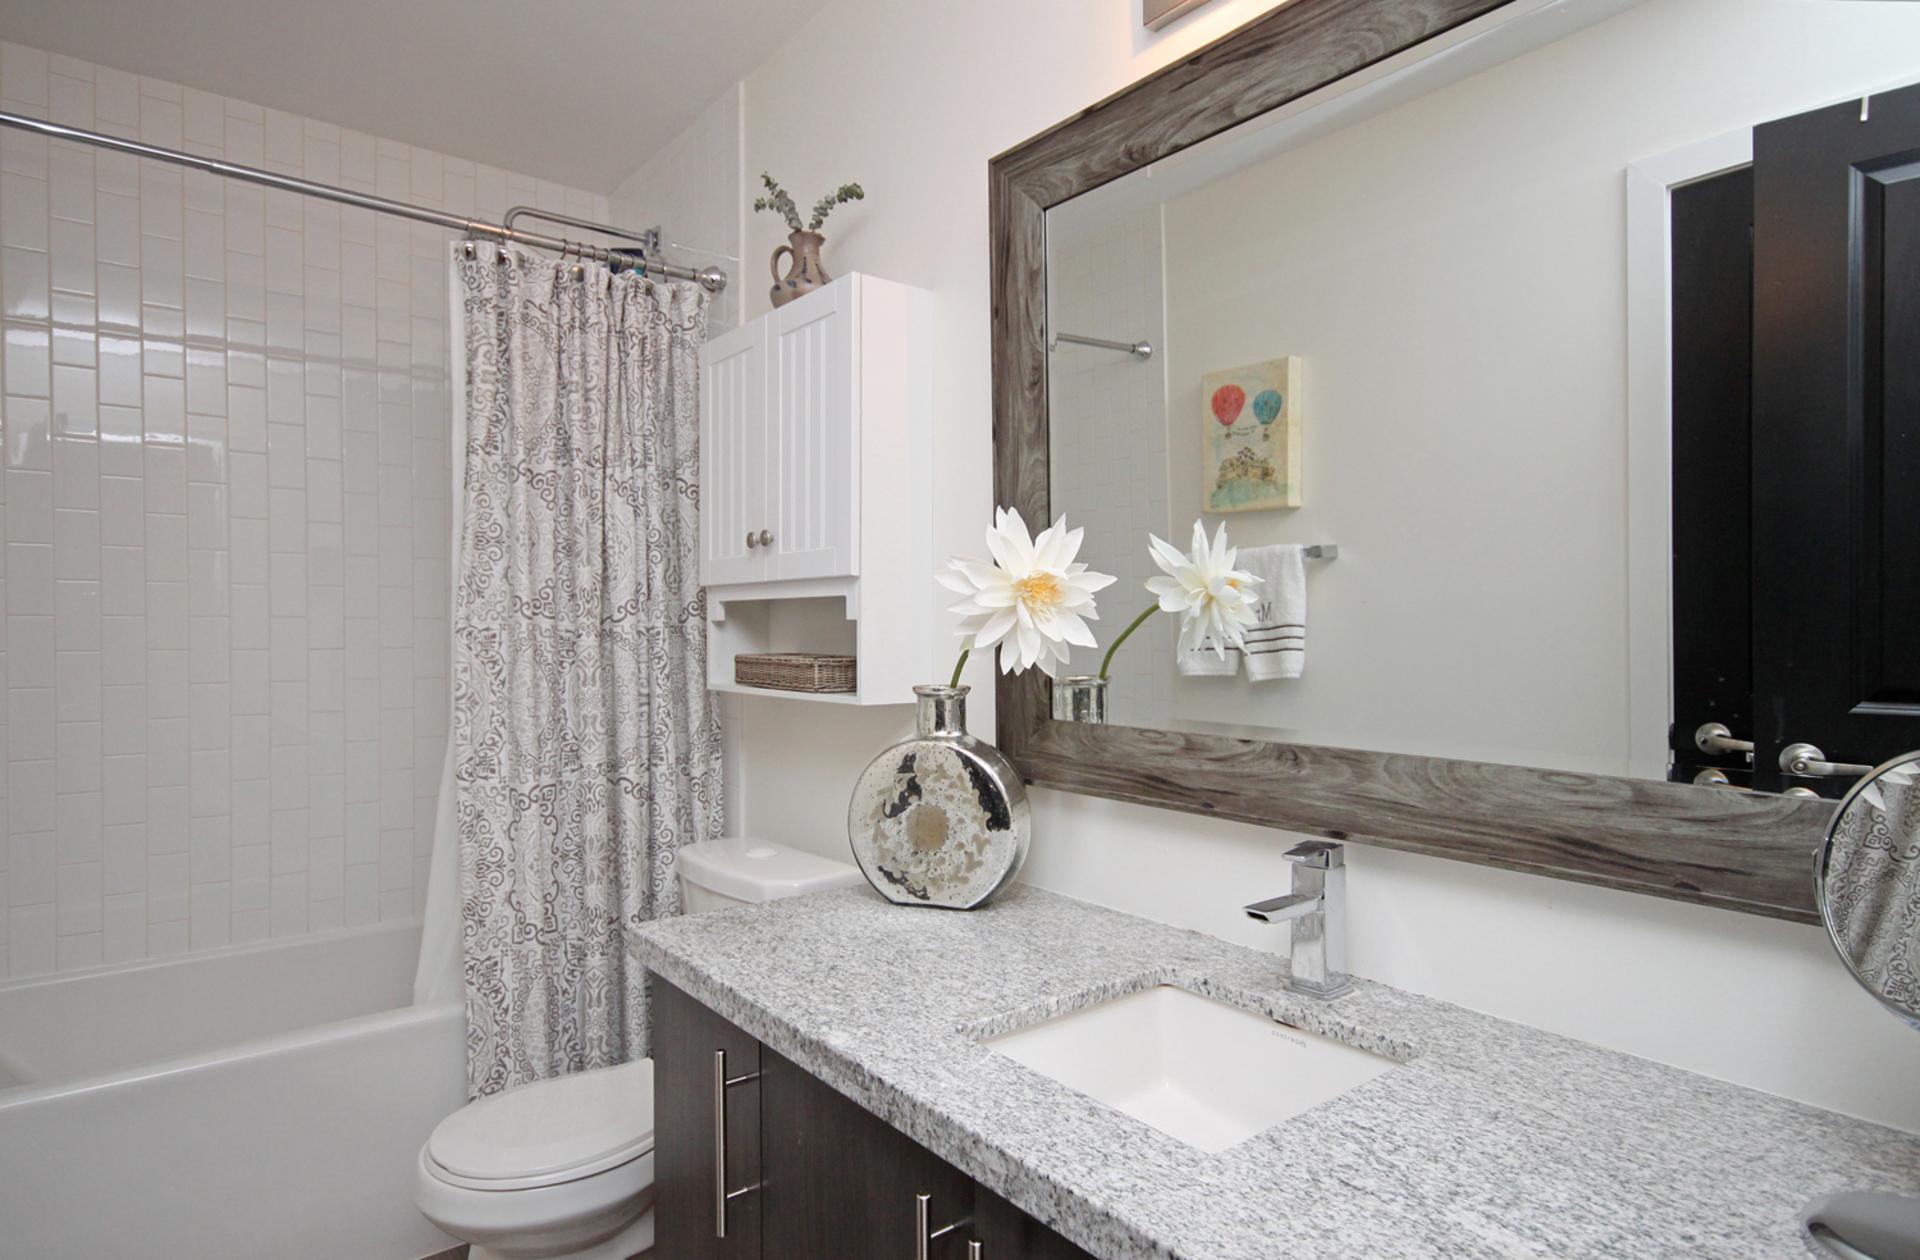 4 Piece Ensuite Bathroom at 114 - 2320 Gerrard Street E, East End-Danforth, Toronto